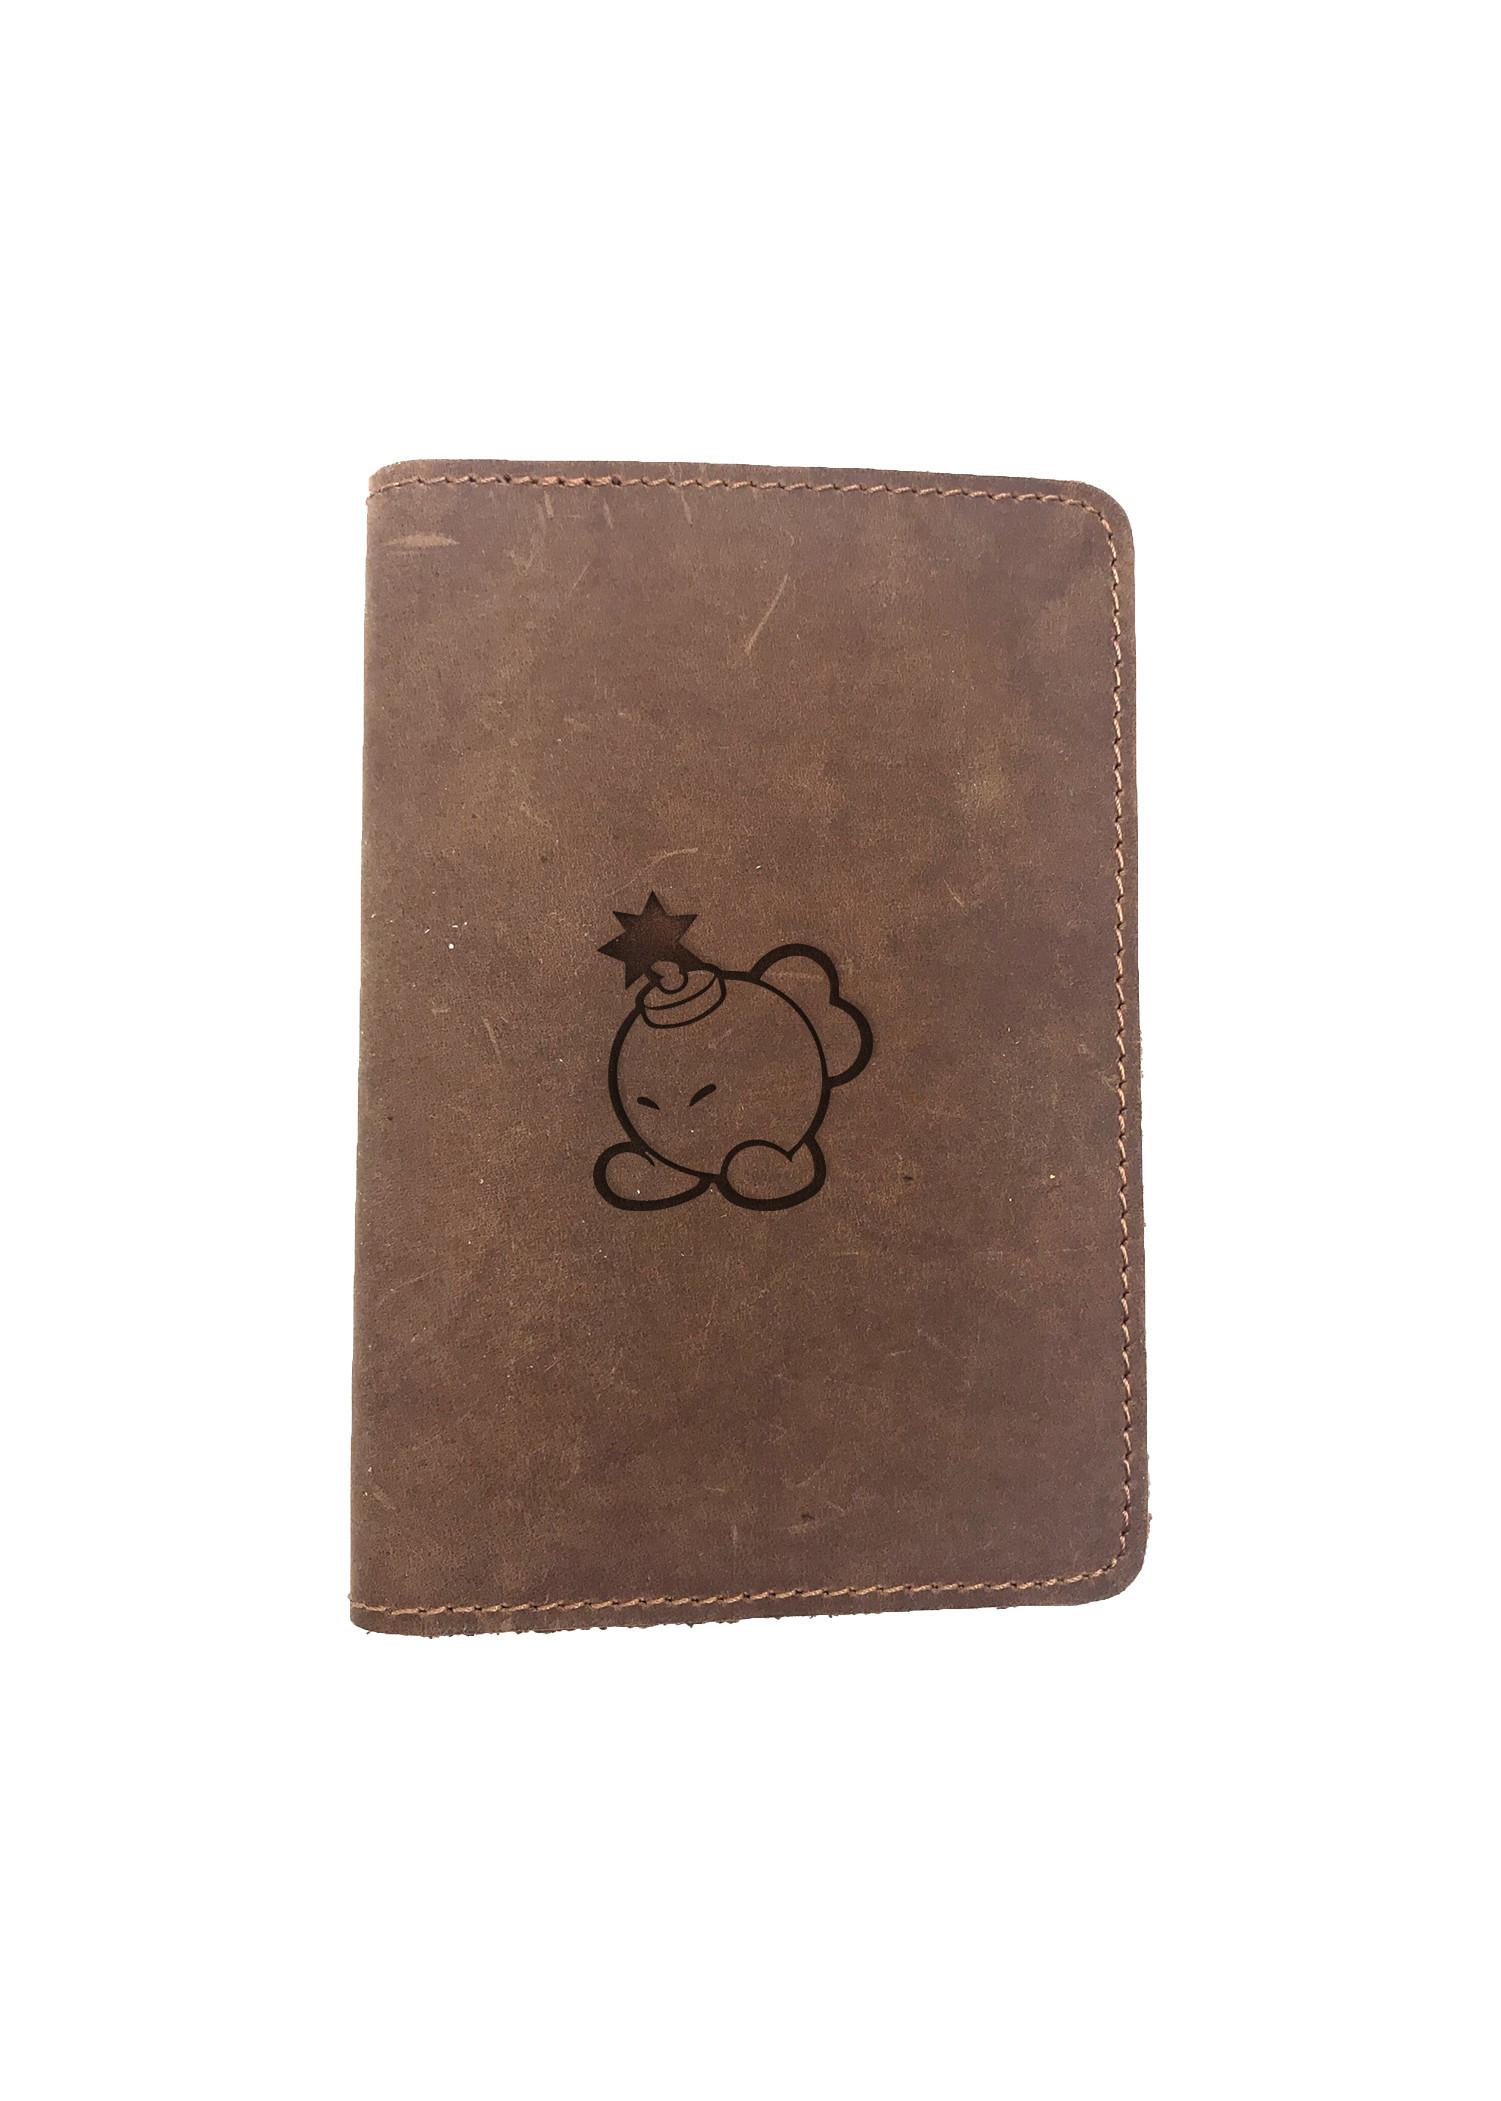 Passport Cover Bao Da Hộ Chiếu Da Sáp Khắc Hình Hình SUPER BROS BOMB STENCIL MARIO (BROWN)